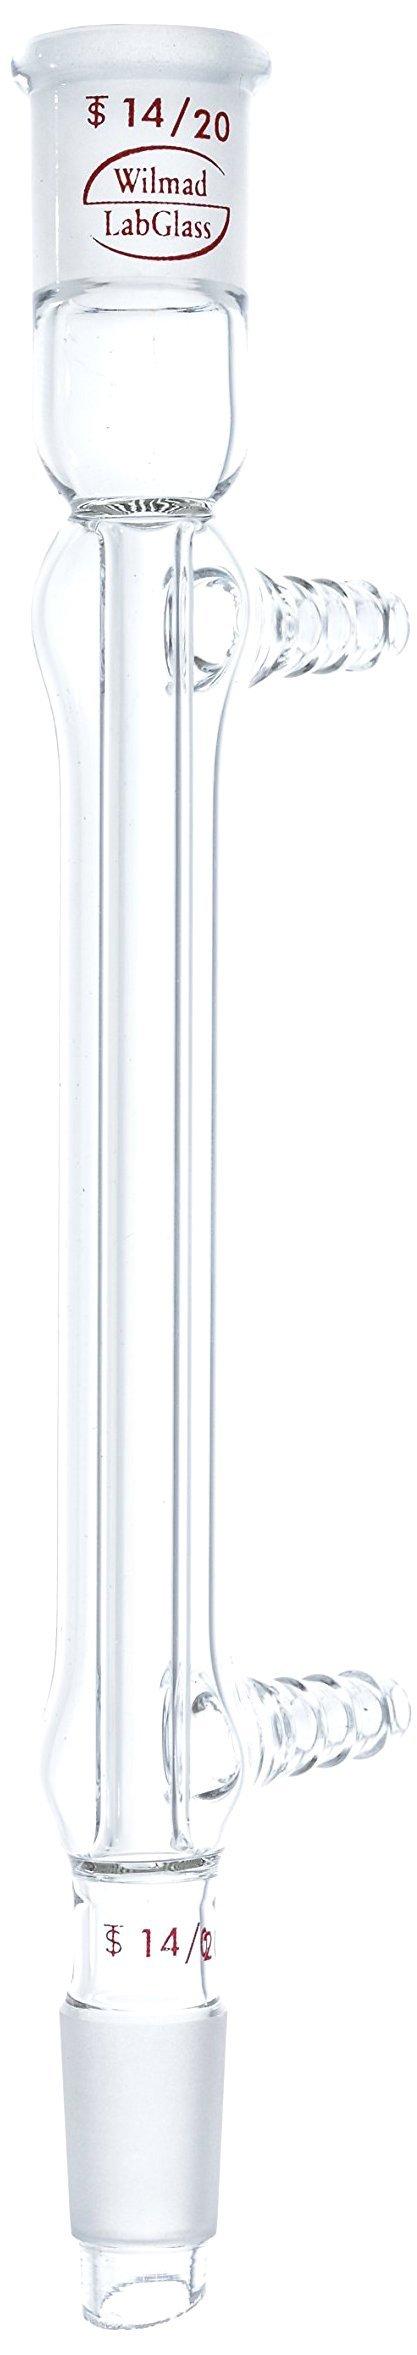 Wilmad-LabGlass ML-590-700 West Condenser, 110mm, Standard Taper 14/20 by SP Scienceware